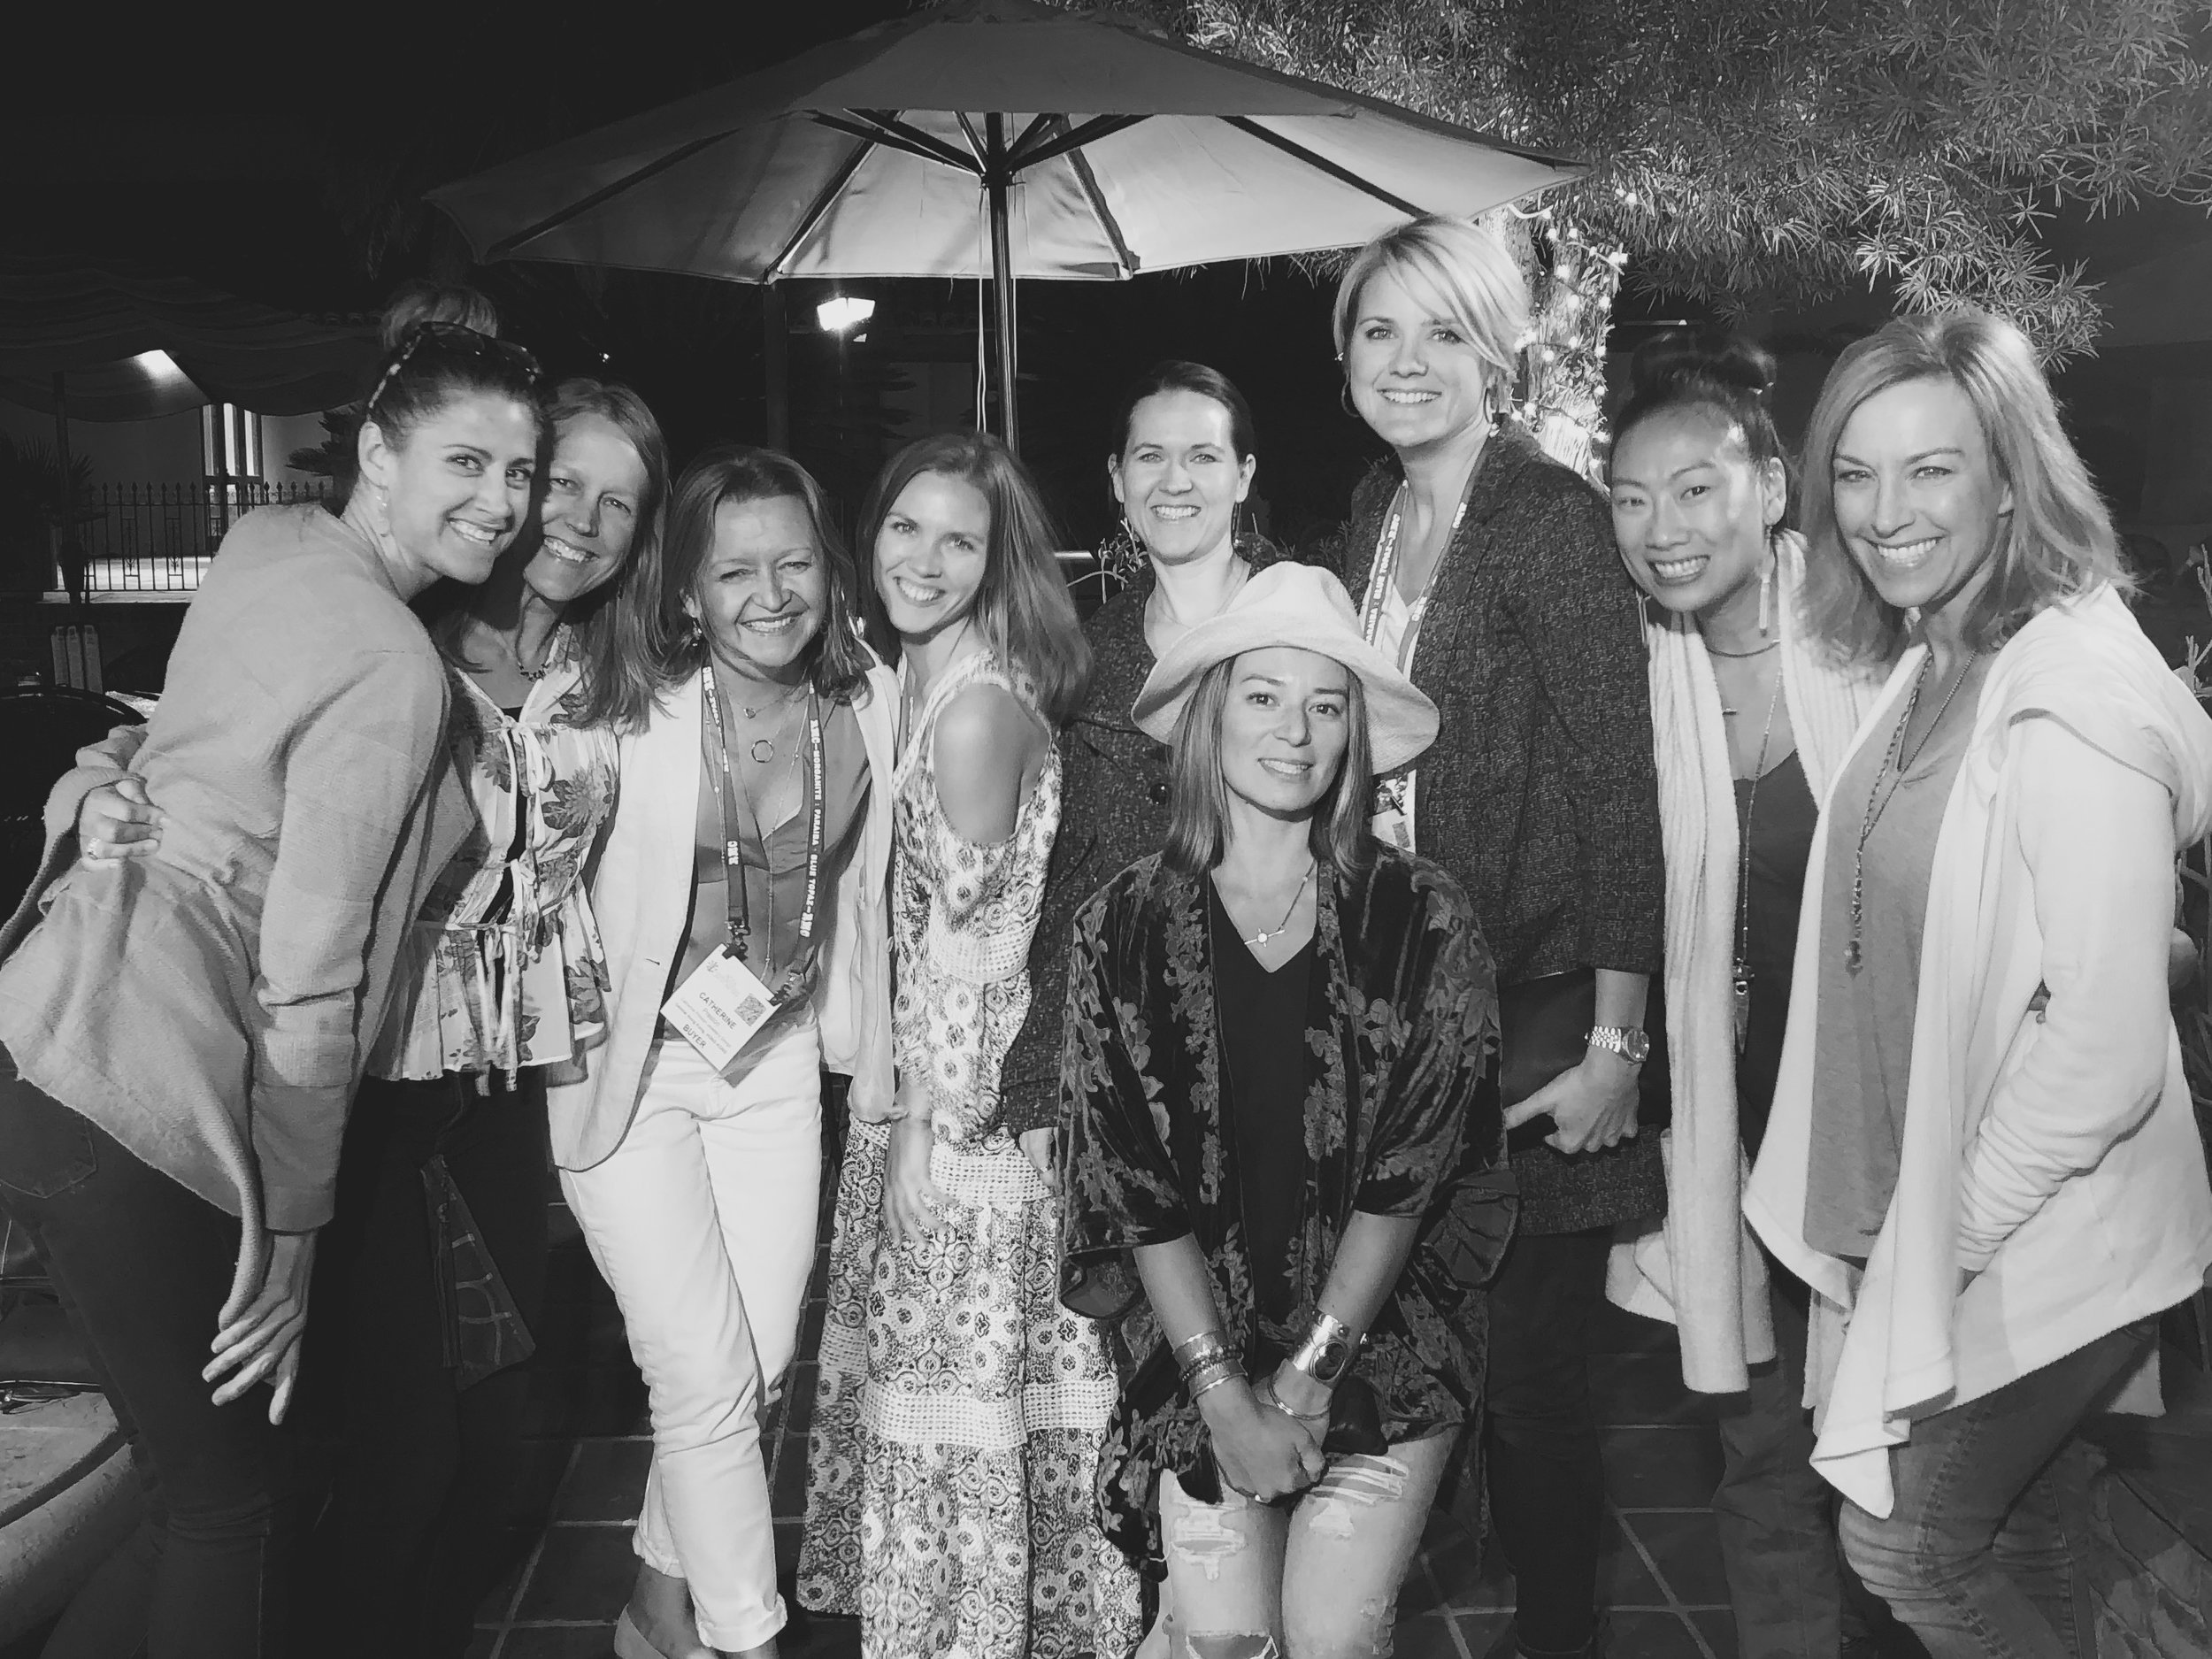 MM Sisterhood. Best group of lady Bosses & fierce jewelry designers. Tucson 2018.